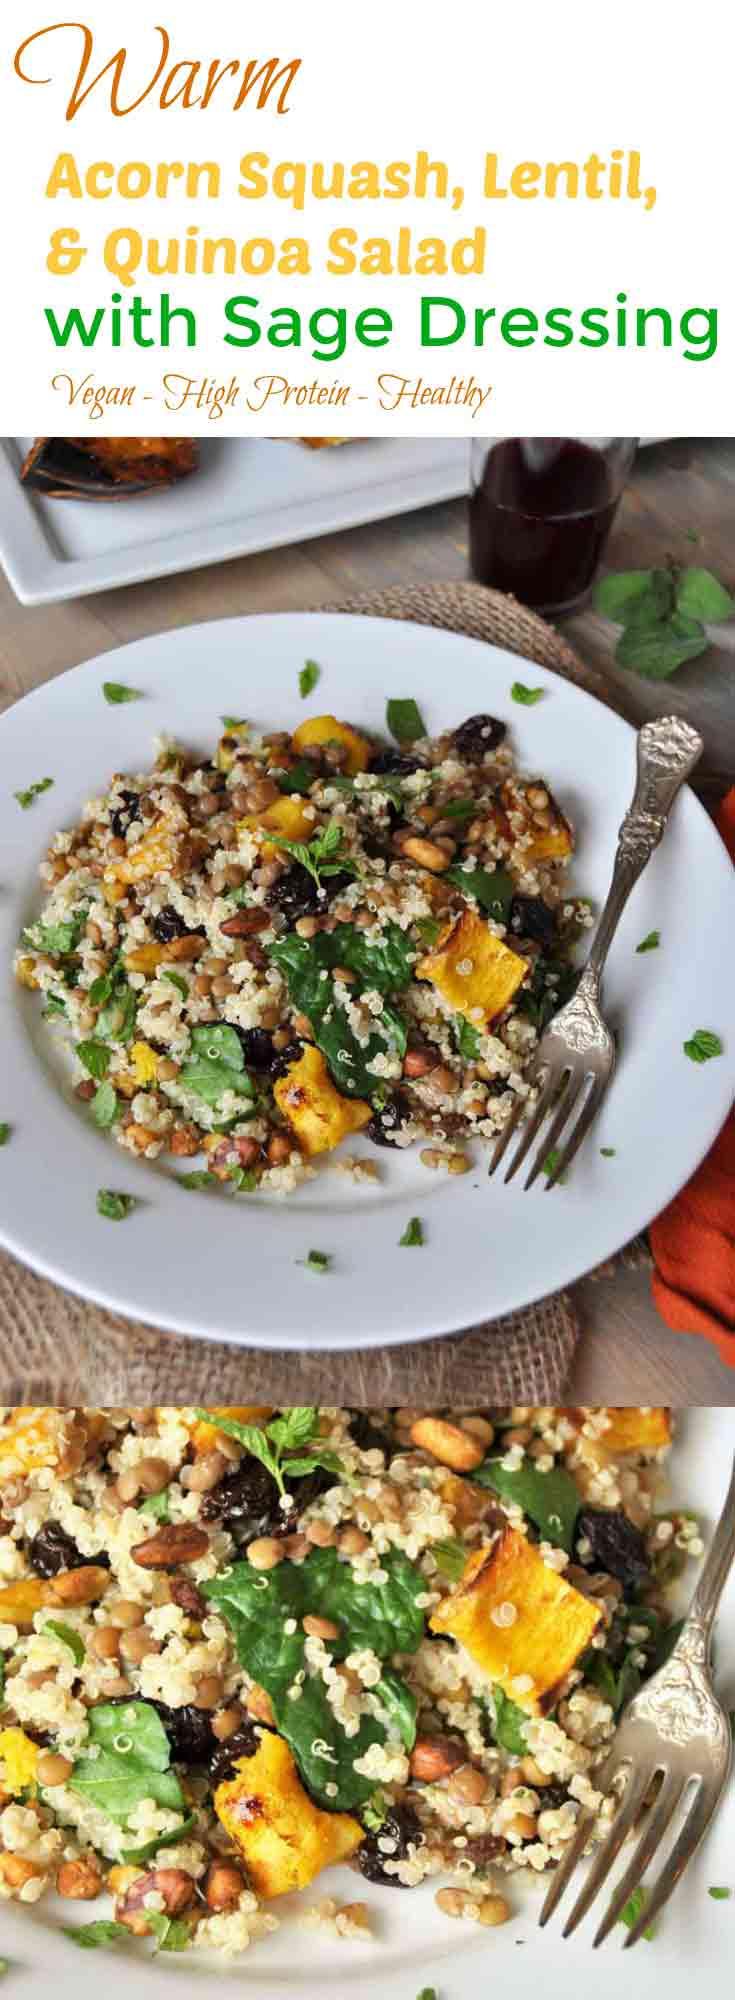 salad with roasted acorn squash, lentils, quinoa, and sage dressing ...